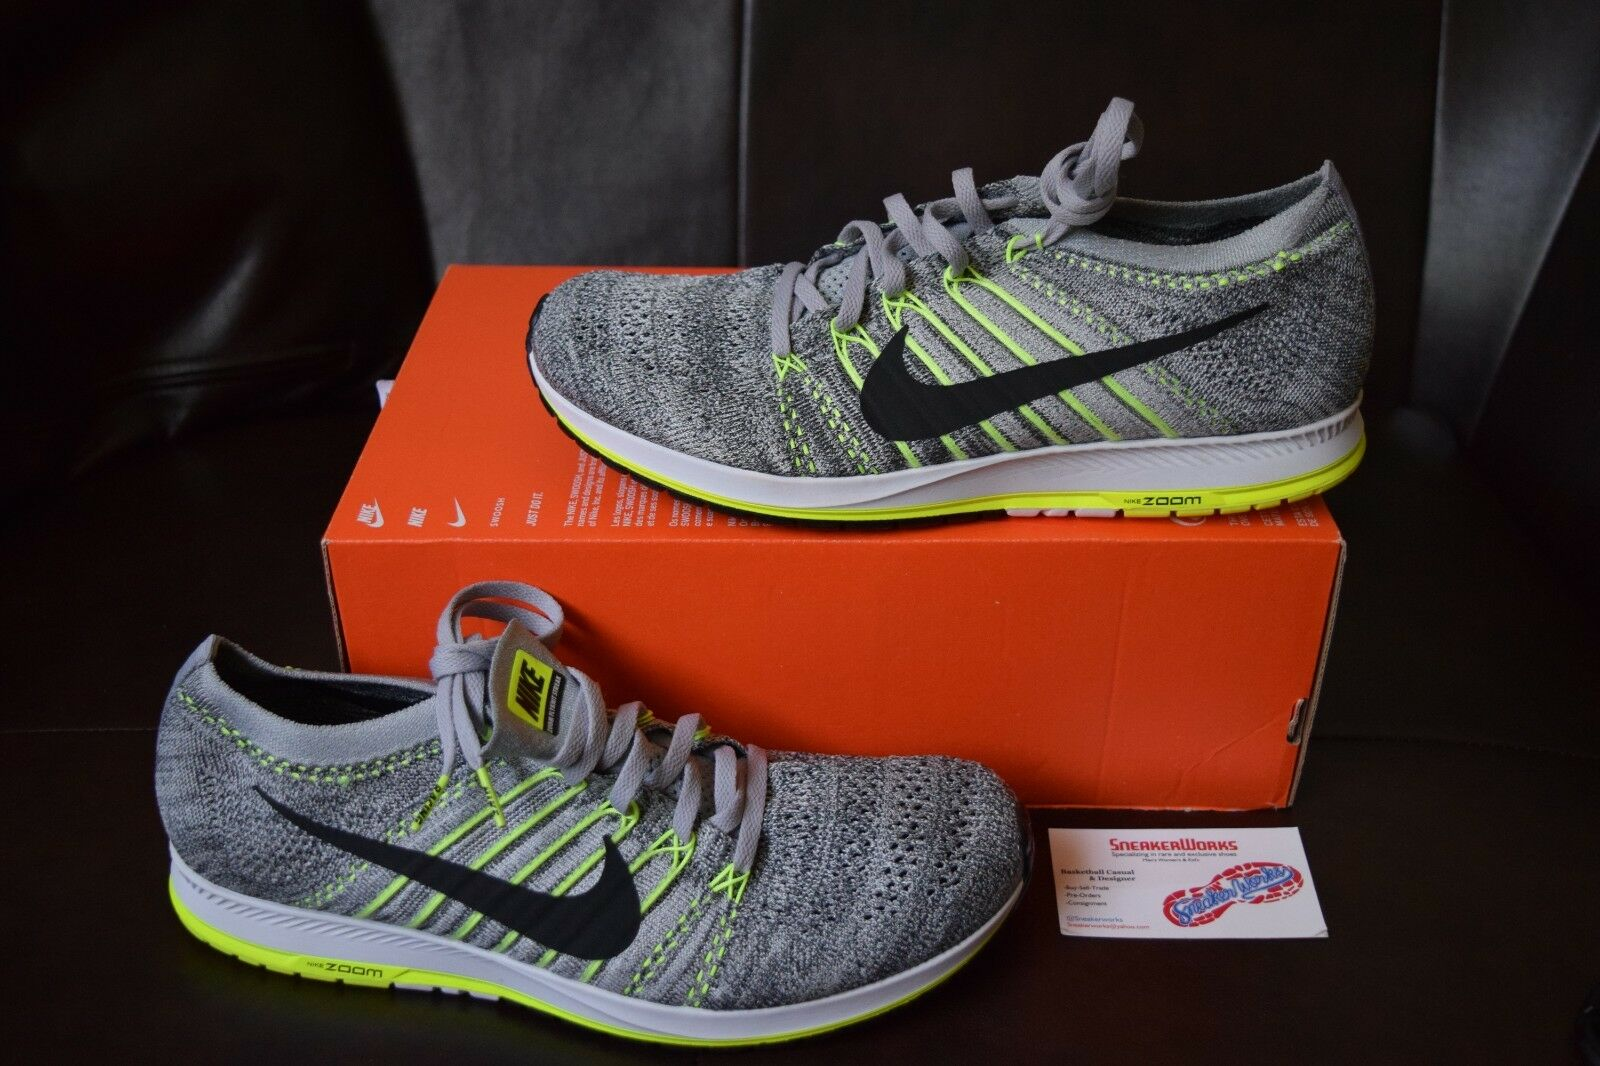 New Nike Flyknit Grey Streak Sz 4.5-10.5 Wolf Grey Flyknit Black Volt Green Runner 835994-007 60a6f8